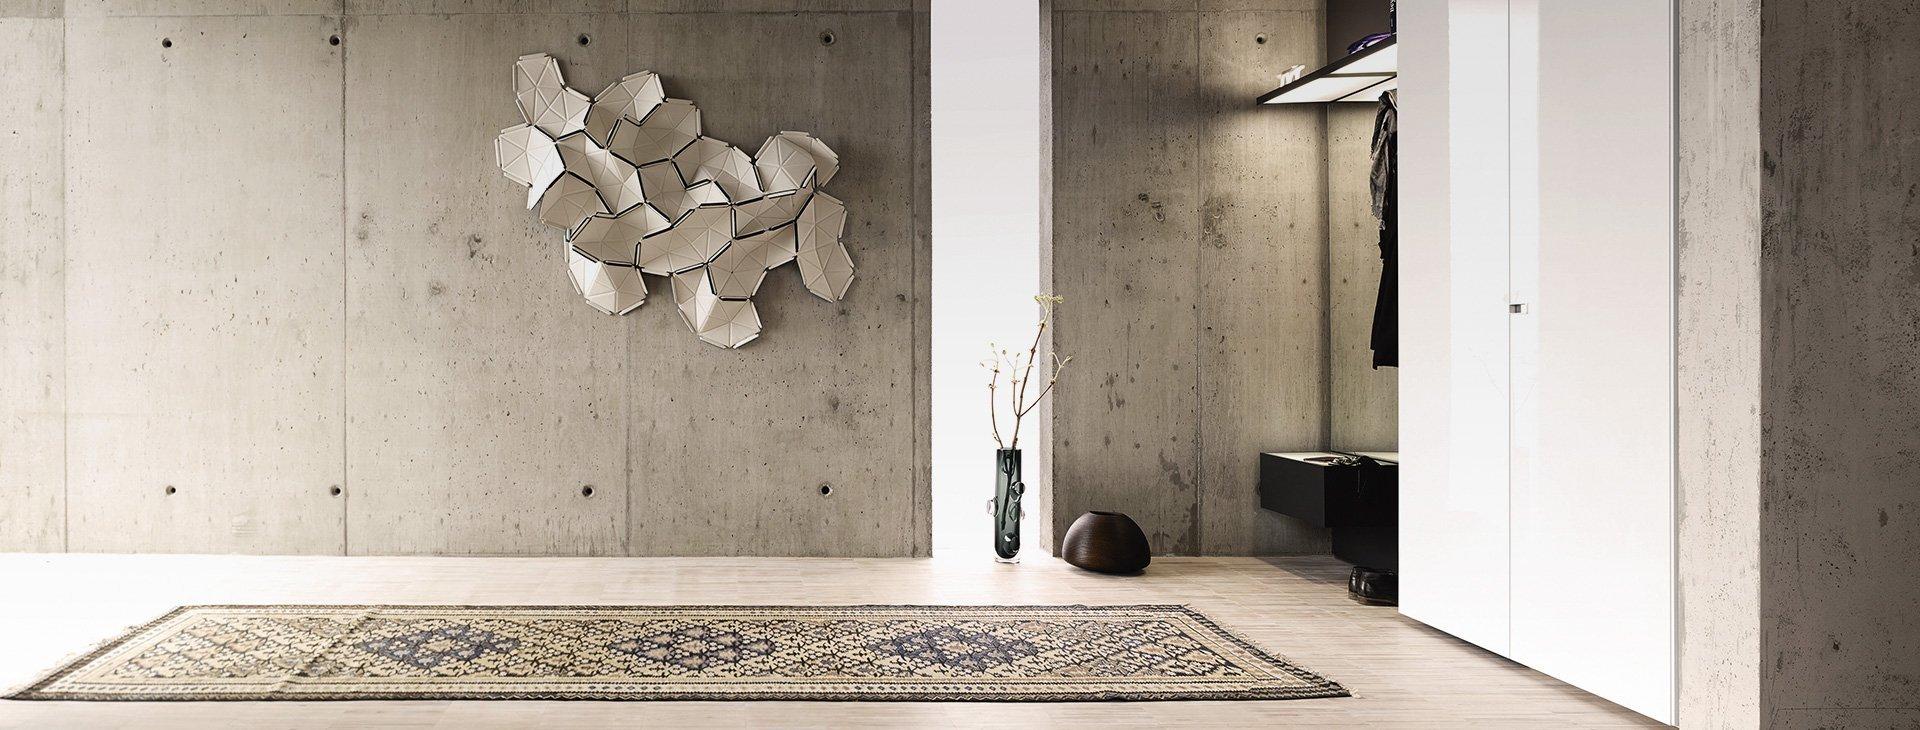 interl bke ihre brands im stilwerk d sseldorf. Black Bedroom Furniture Sets. Home Design Ideas